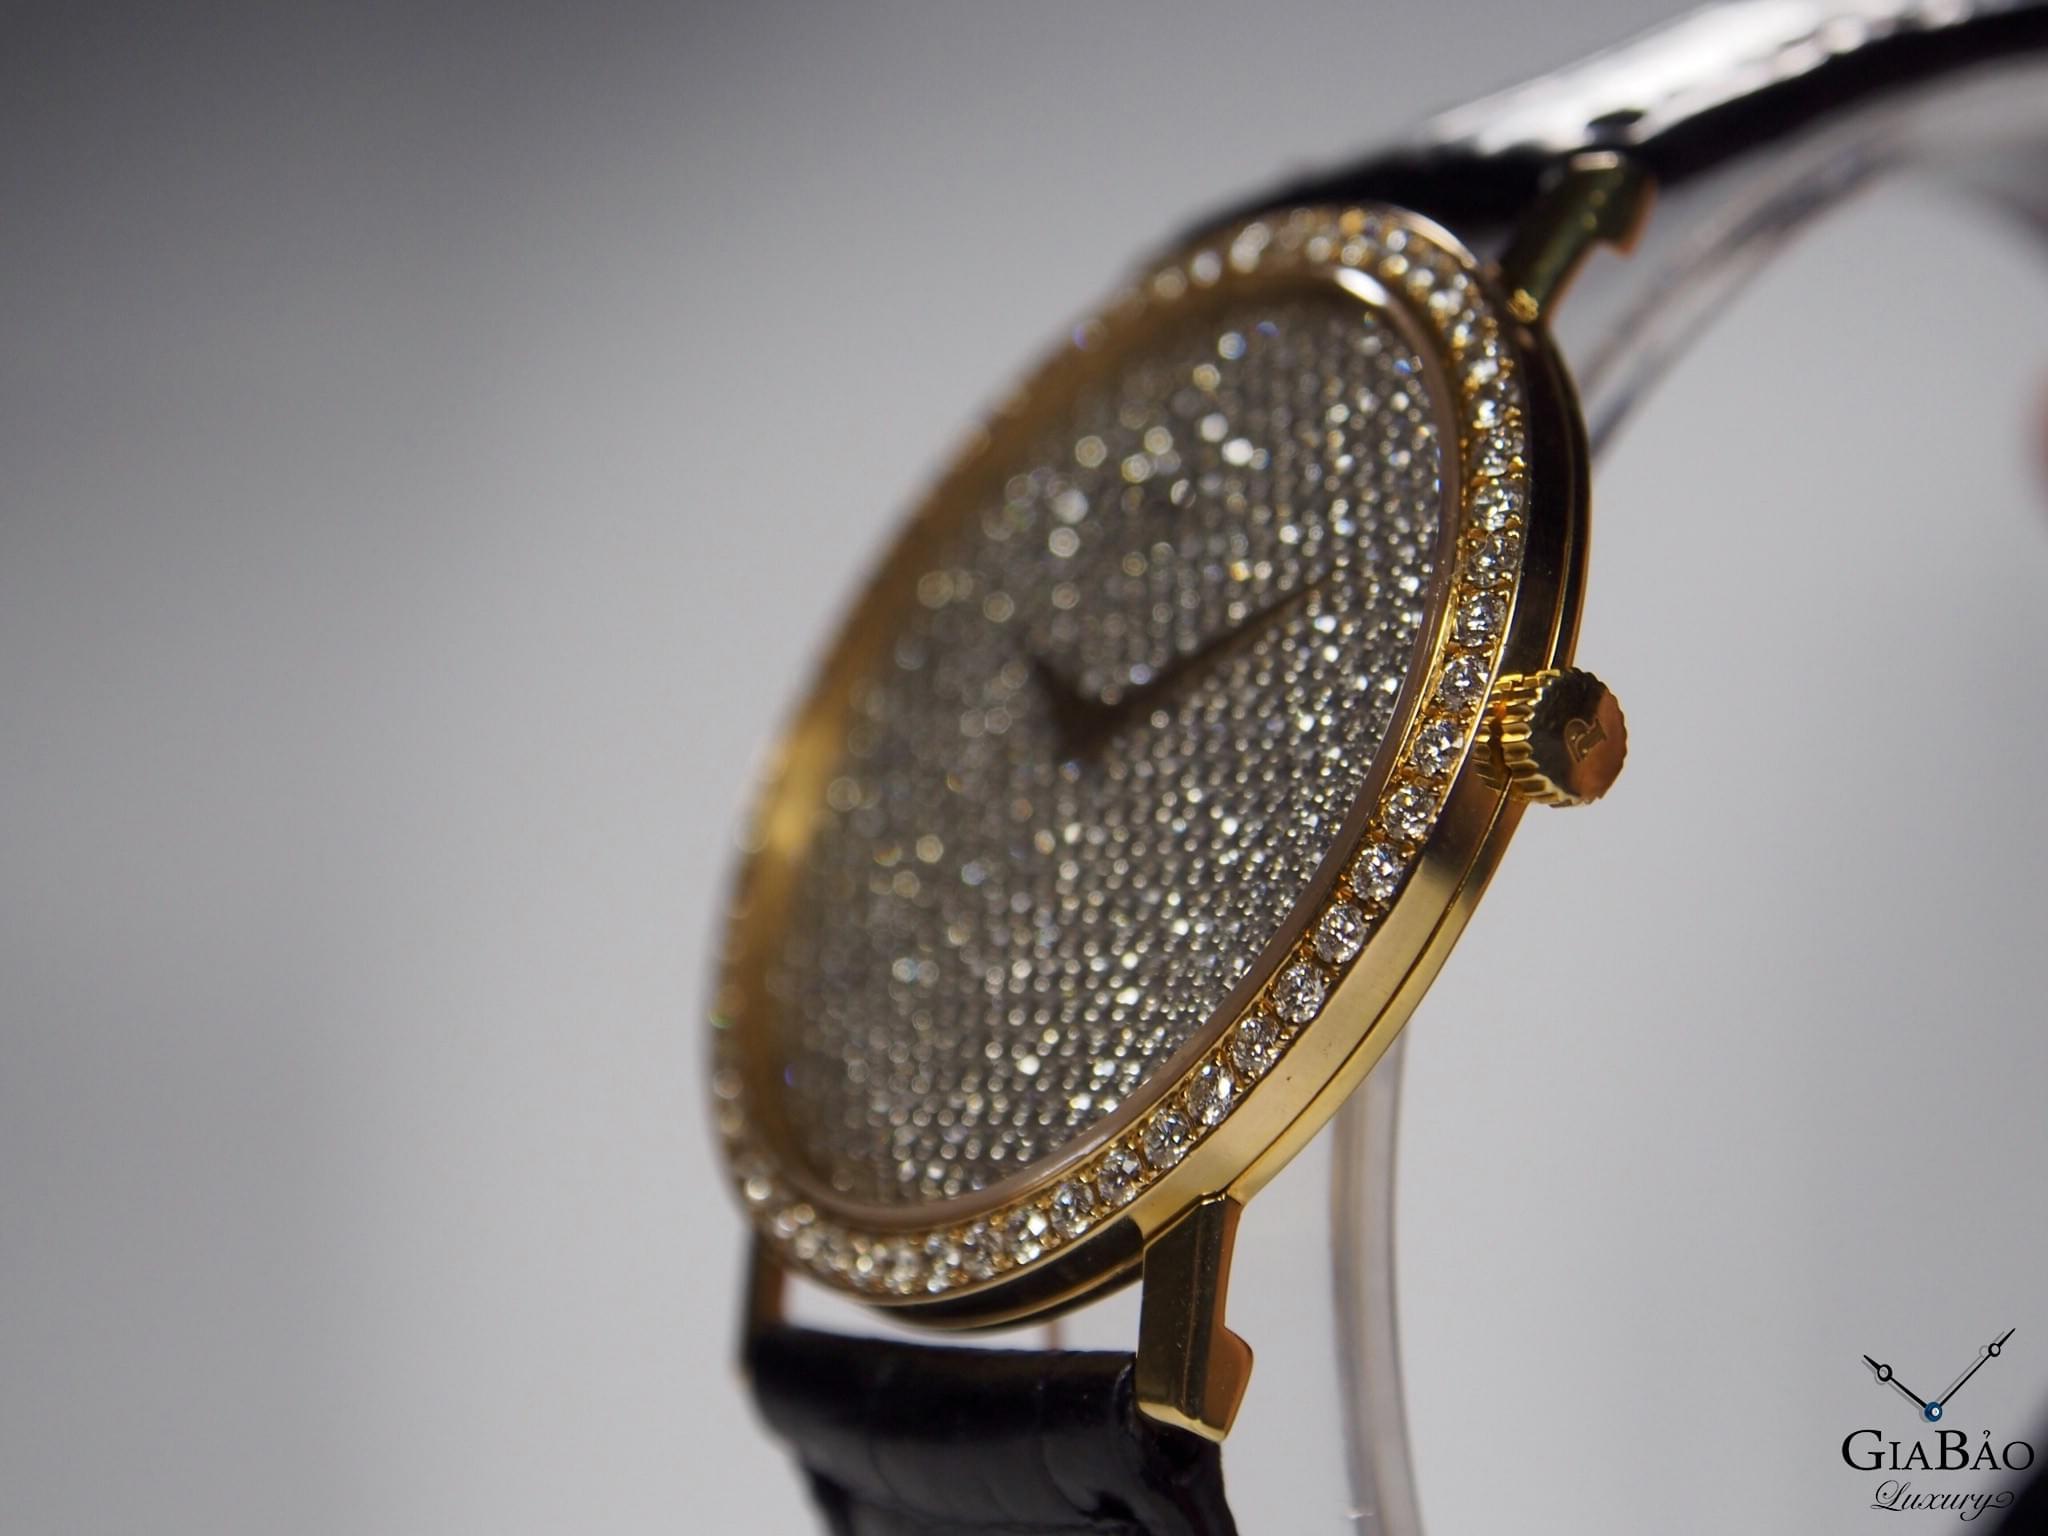 Đồng Hồ Piaget Altiplano 18k Gold Full Diamond